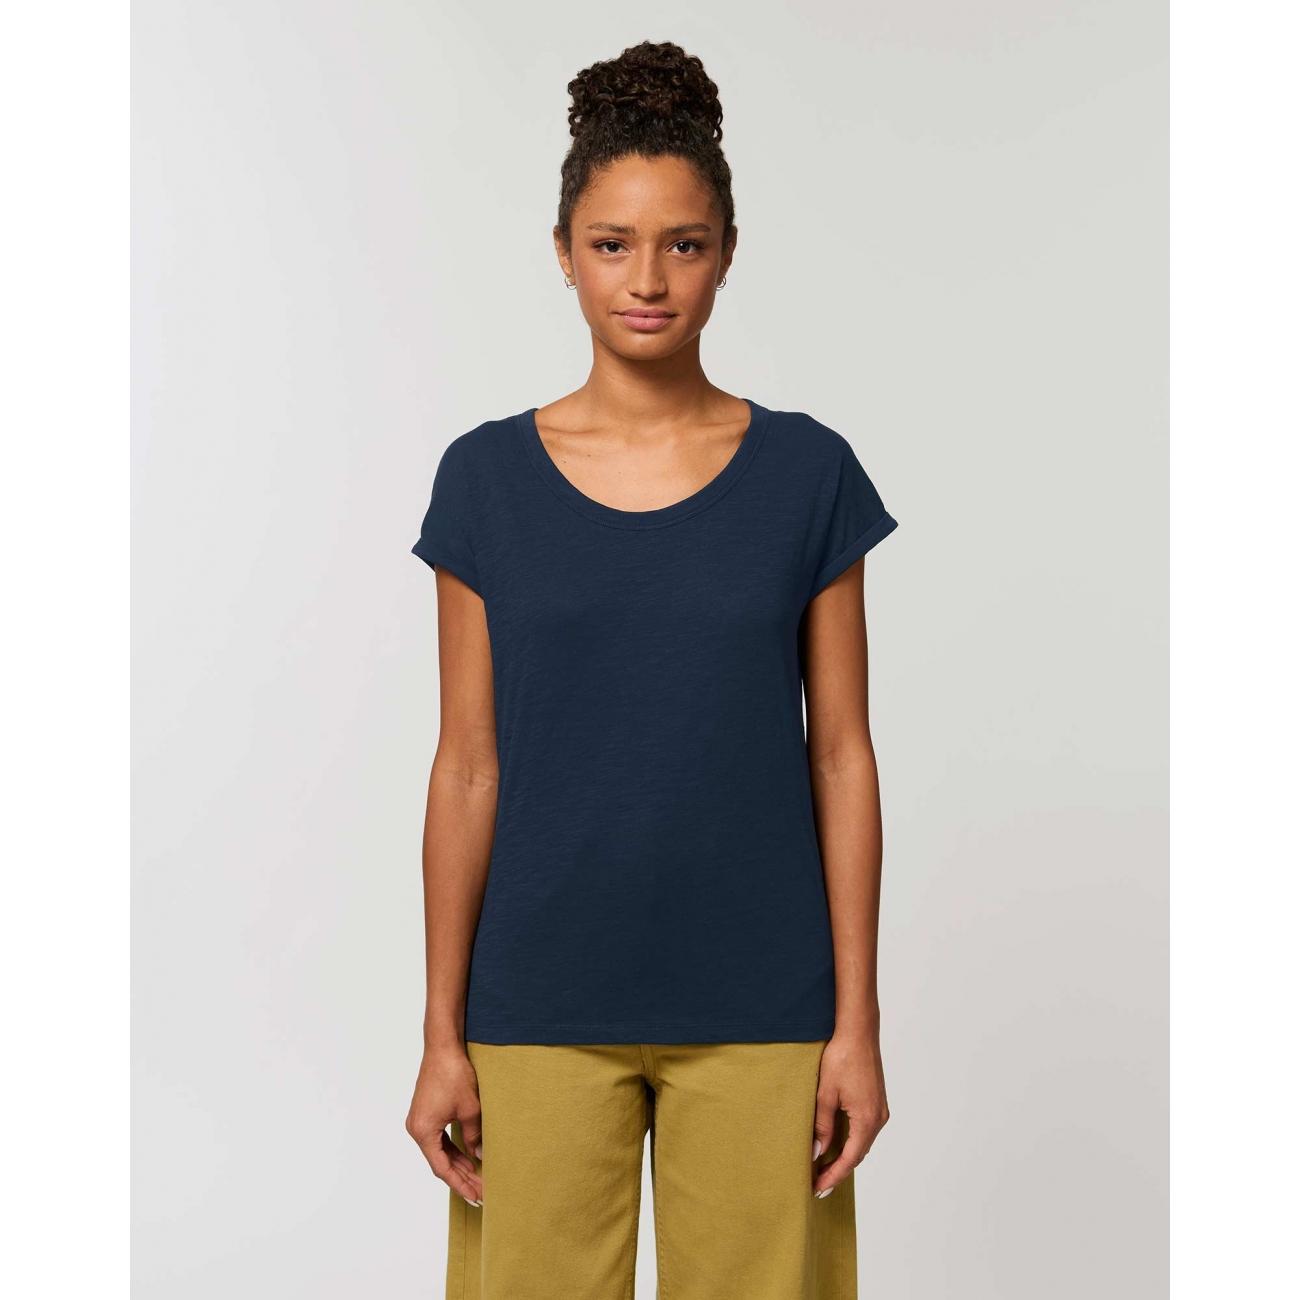 https://tee-shirt-bio.com/9292-thickbox_default/tee-shirt-femme-bleu-navy-manches-repliees-coton-bio-fwf.jpg